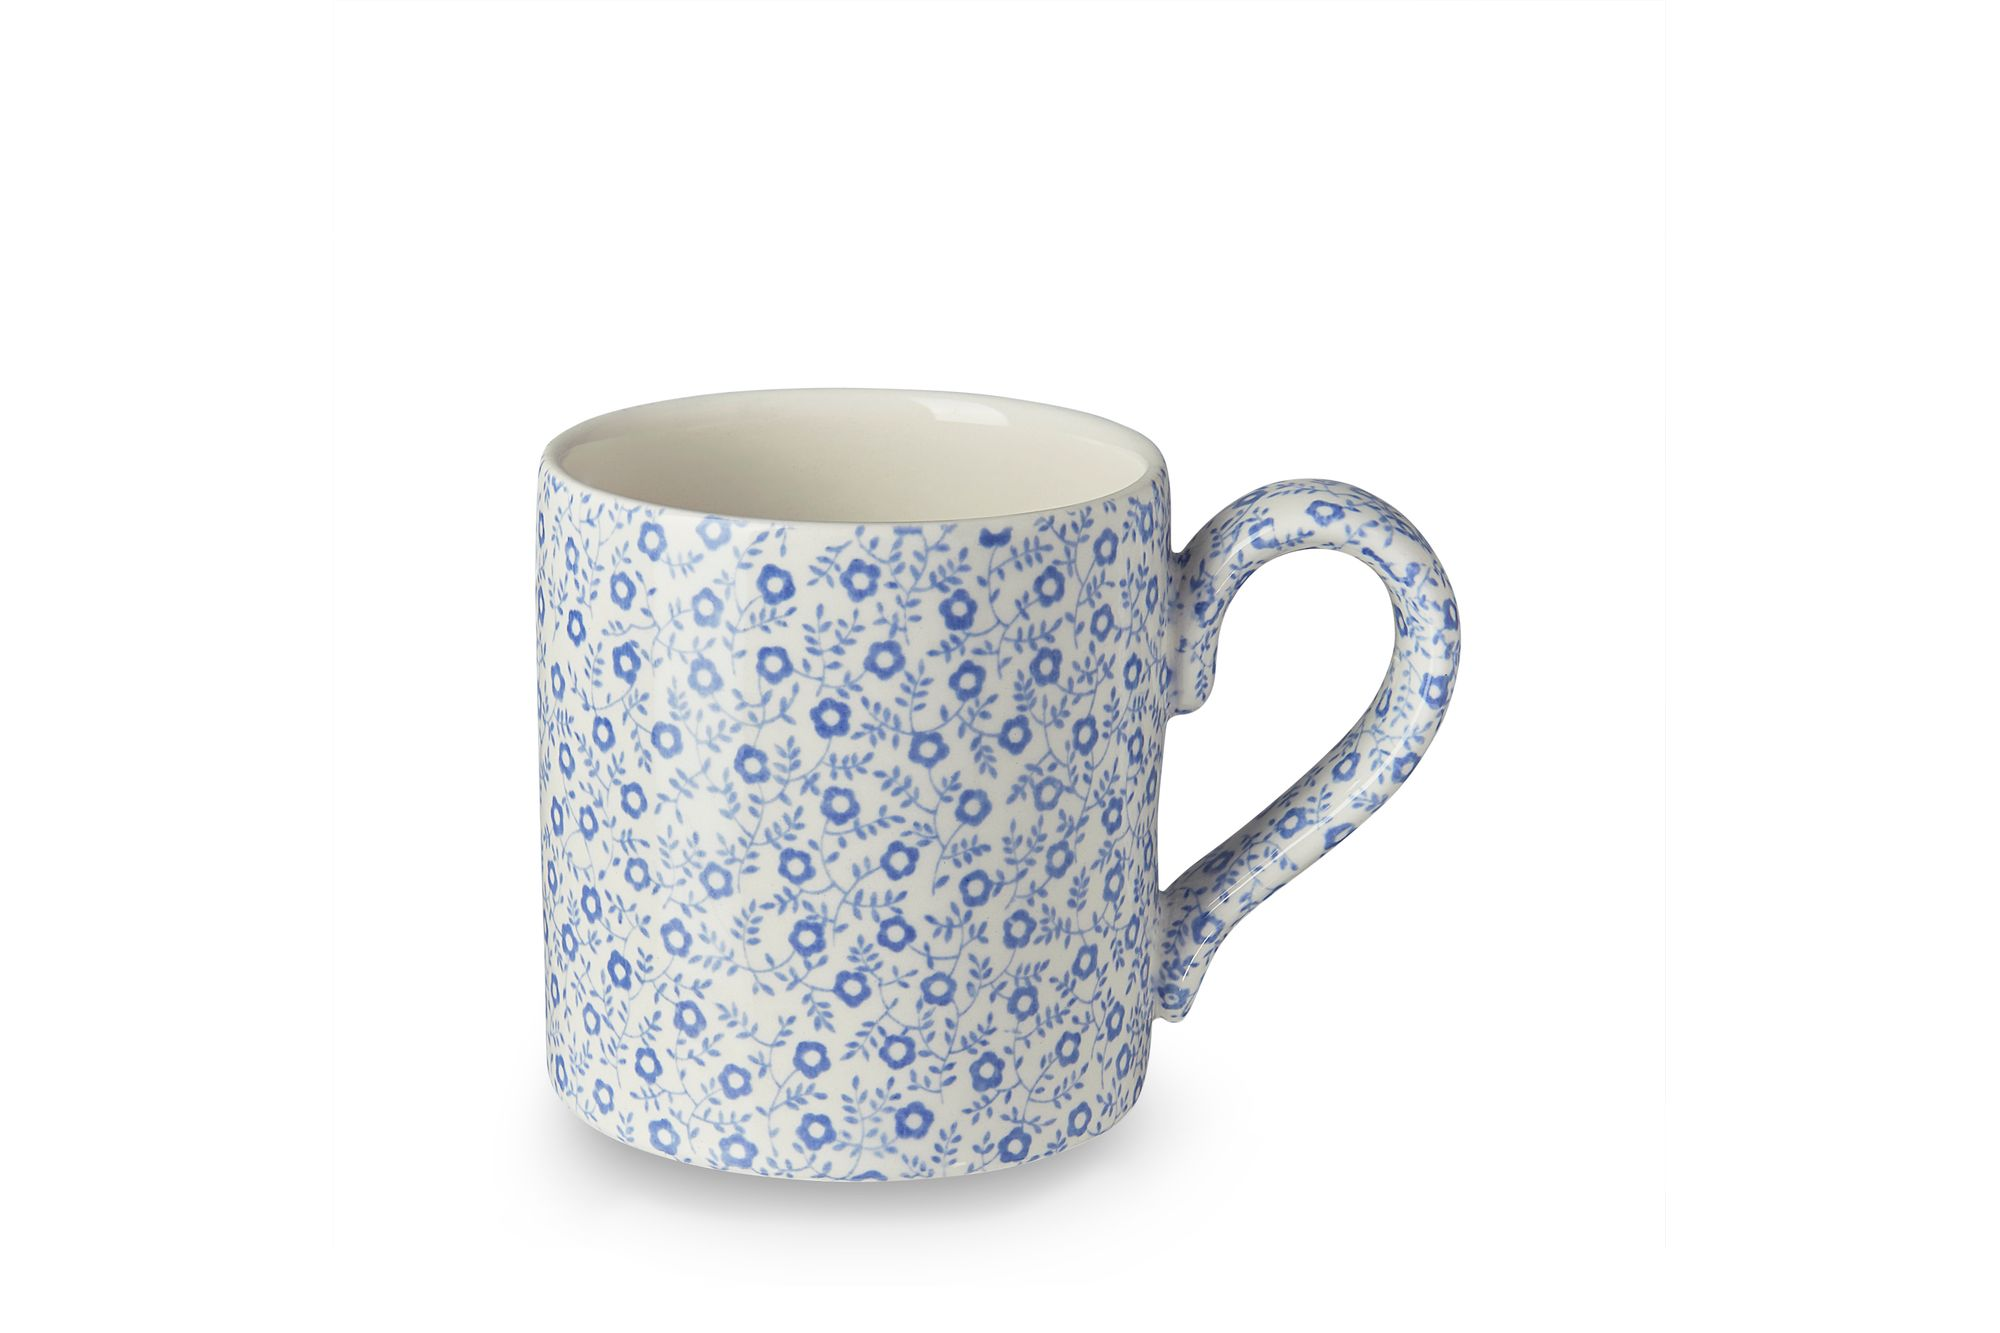 Burleigh Blue Felicity Mug thumb 1